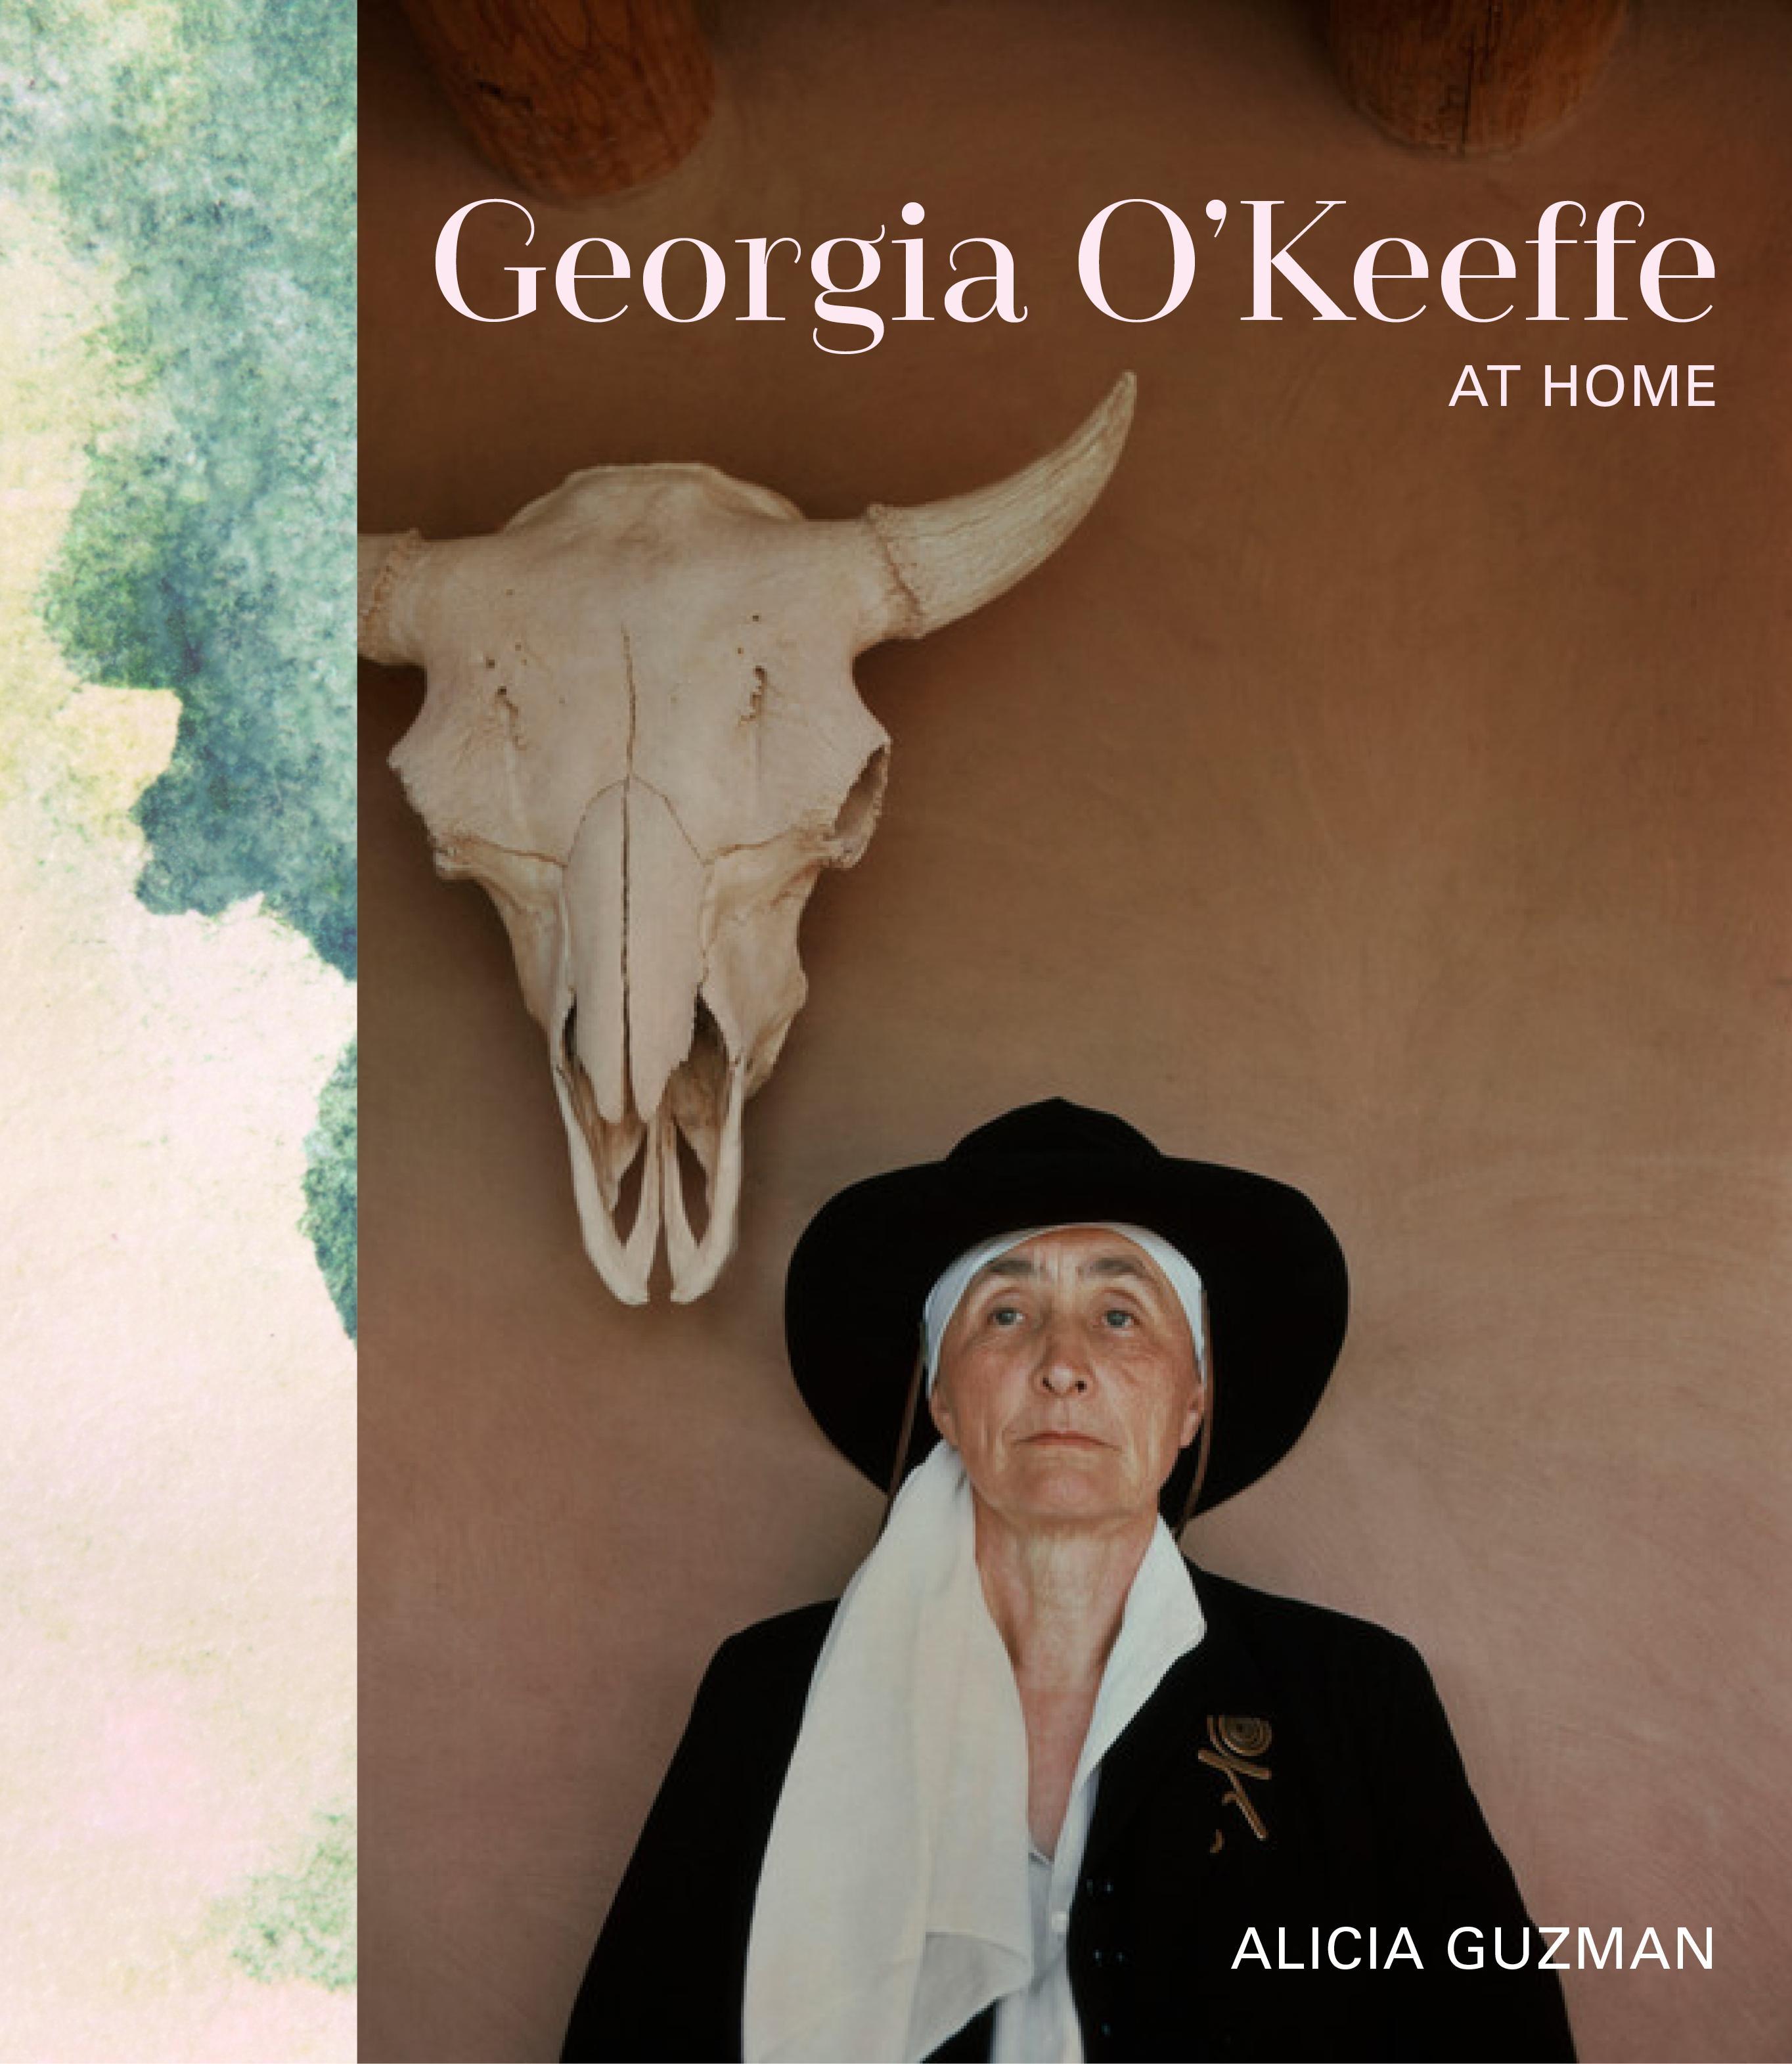 Georgia O'KeeffeatHome